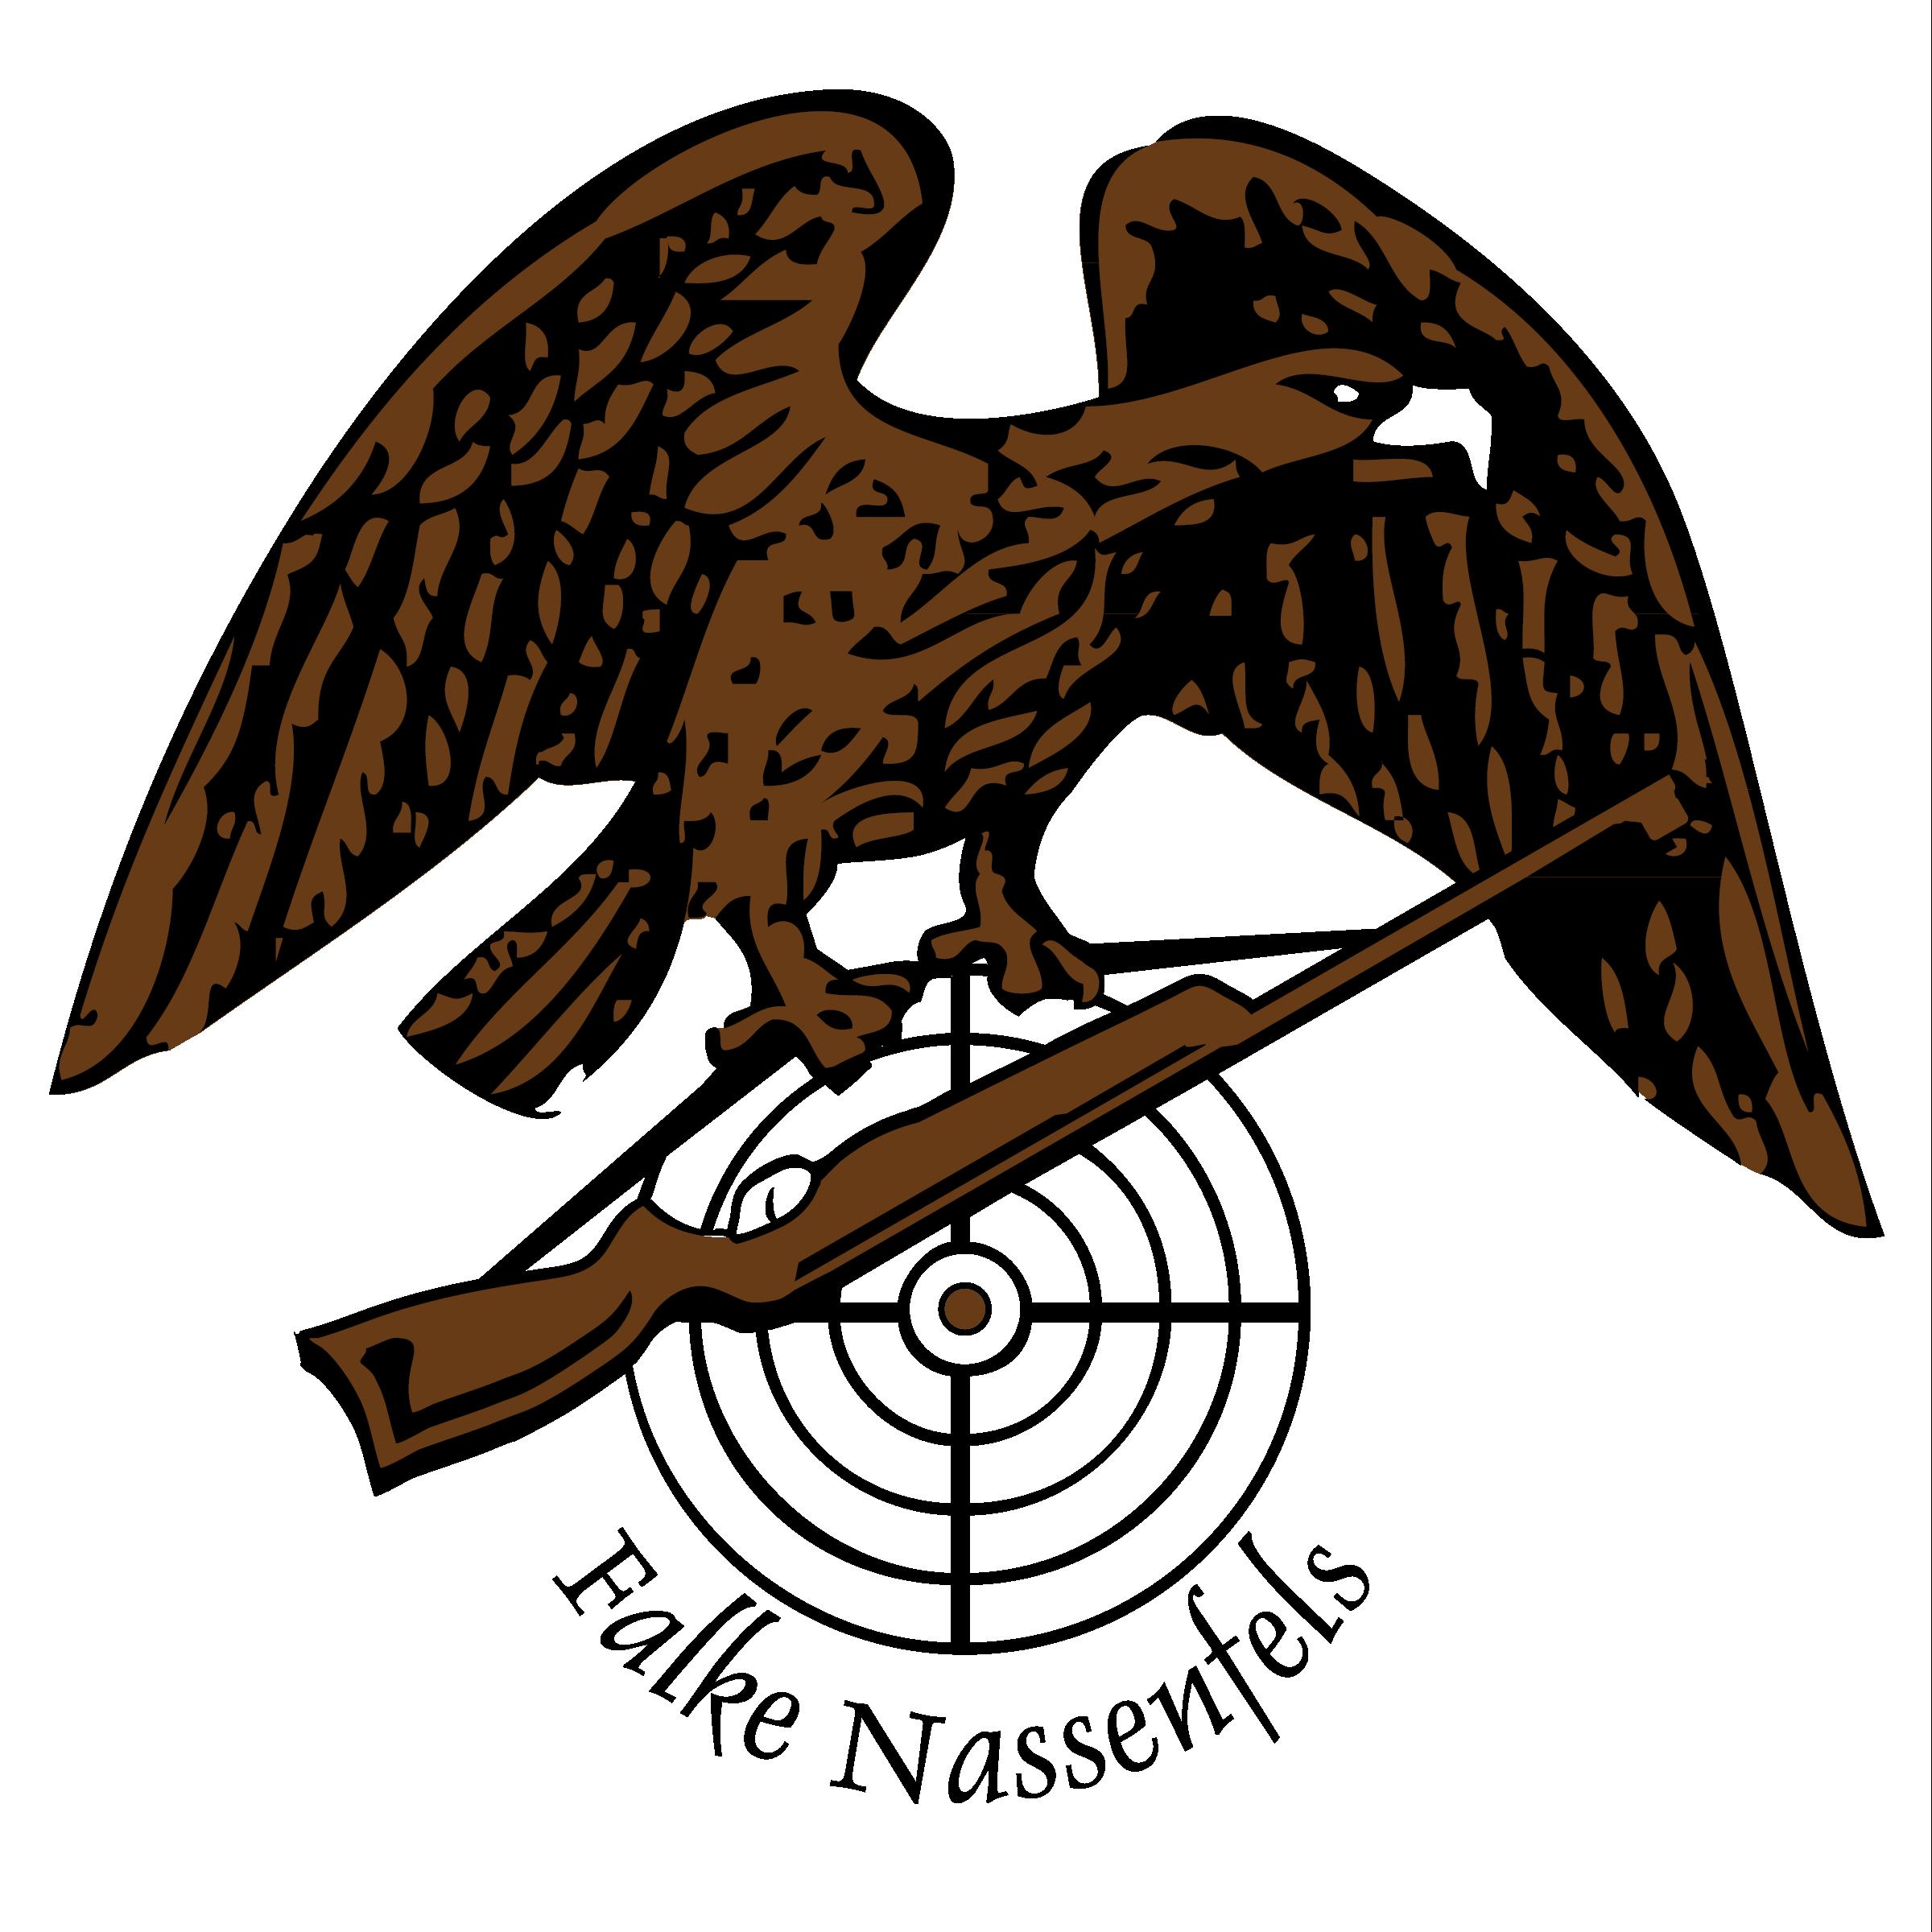 Falke Nassenfels Logo